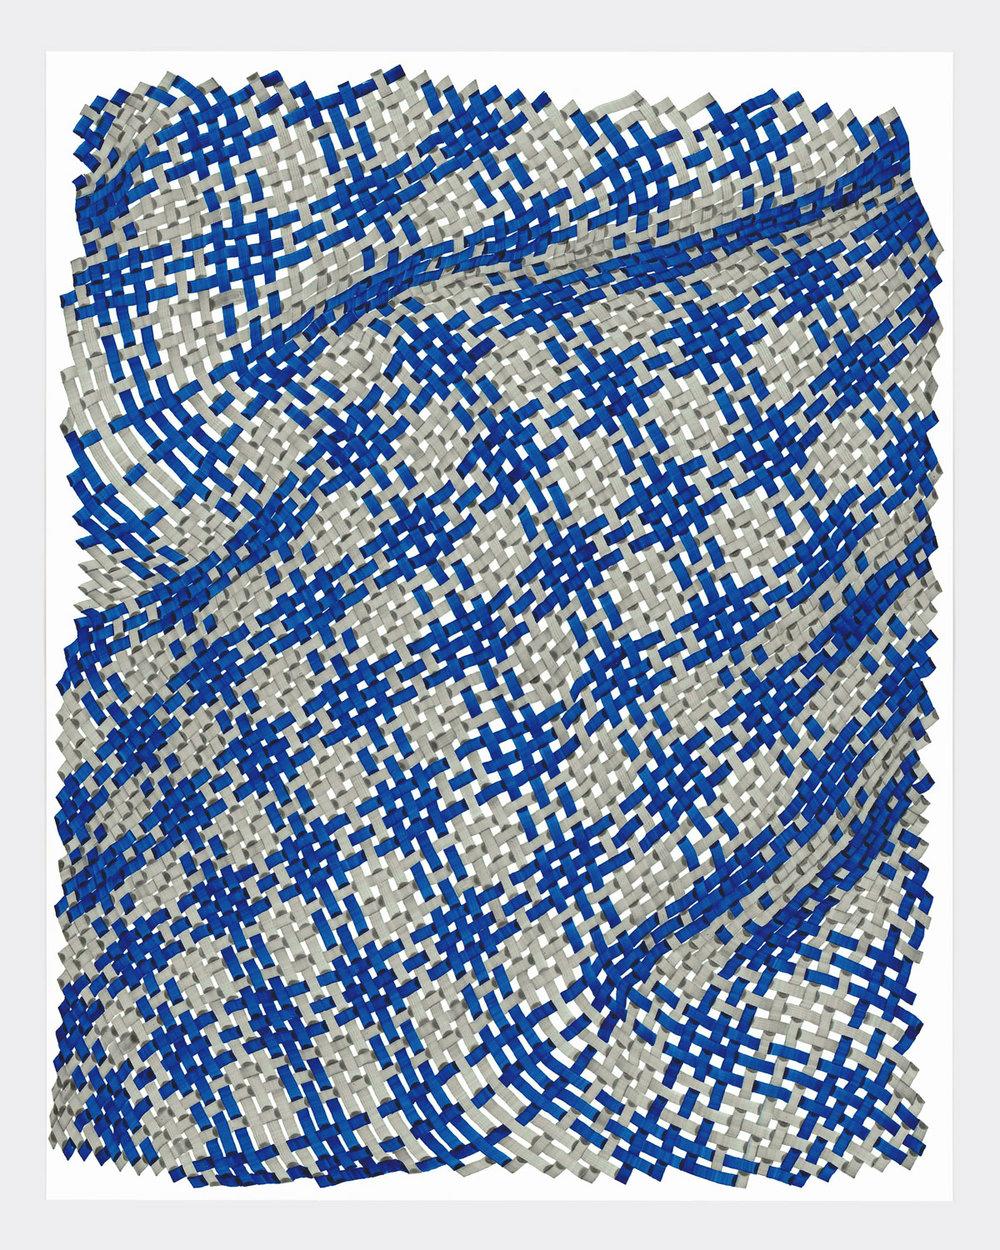 Woven Lines 6 ,  2019   acrylic on yupo medium 14 x 11 in (35.56 x 27.9 cm)